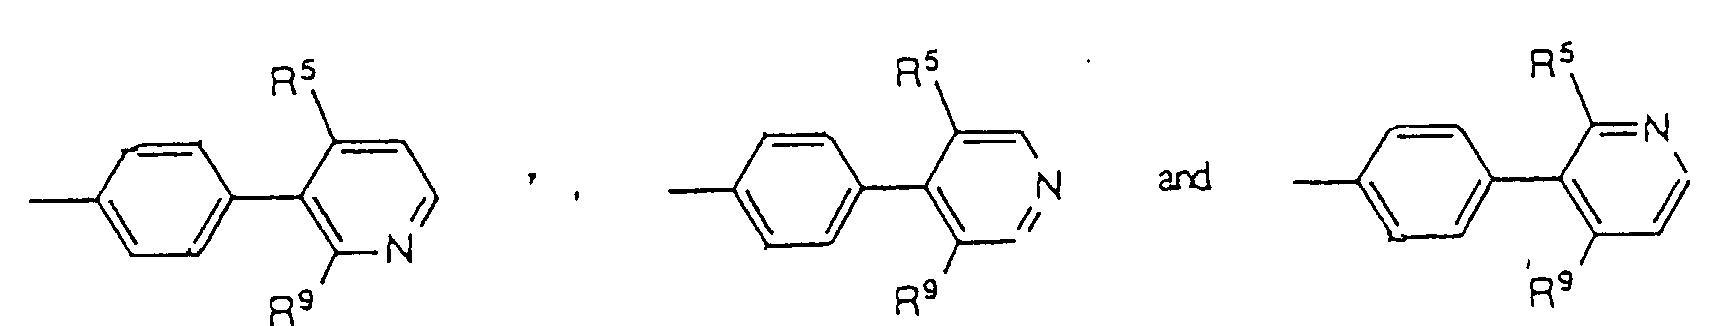 Patent EP0508393B1 - N-arylheteroarylalkyl imidazol-2-one ...